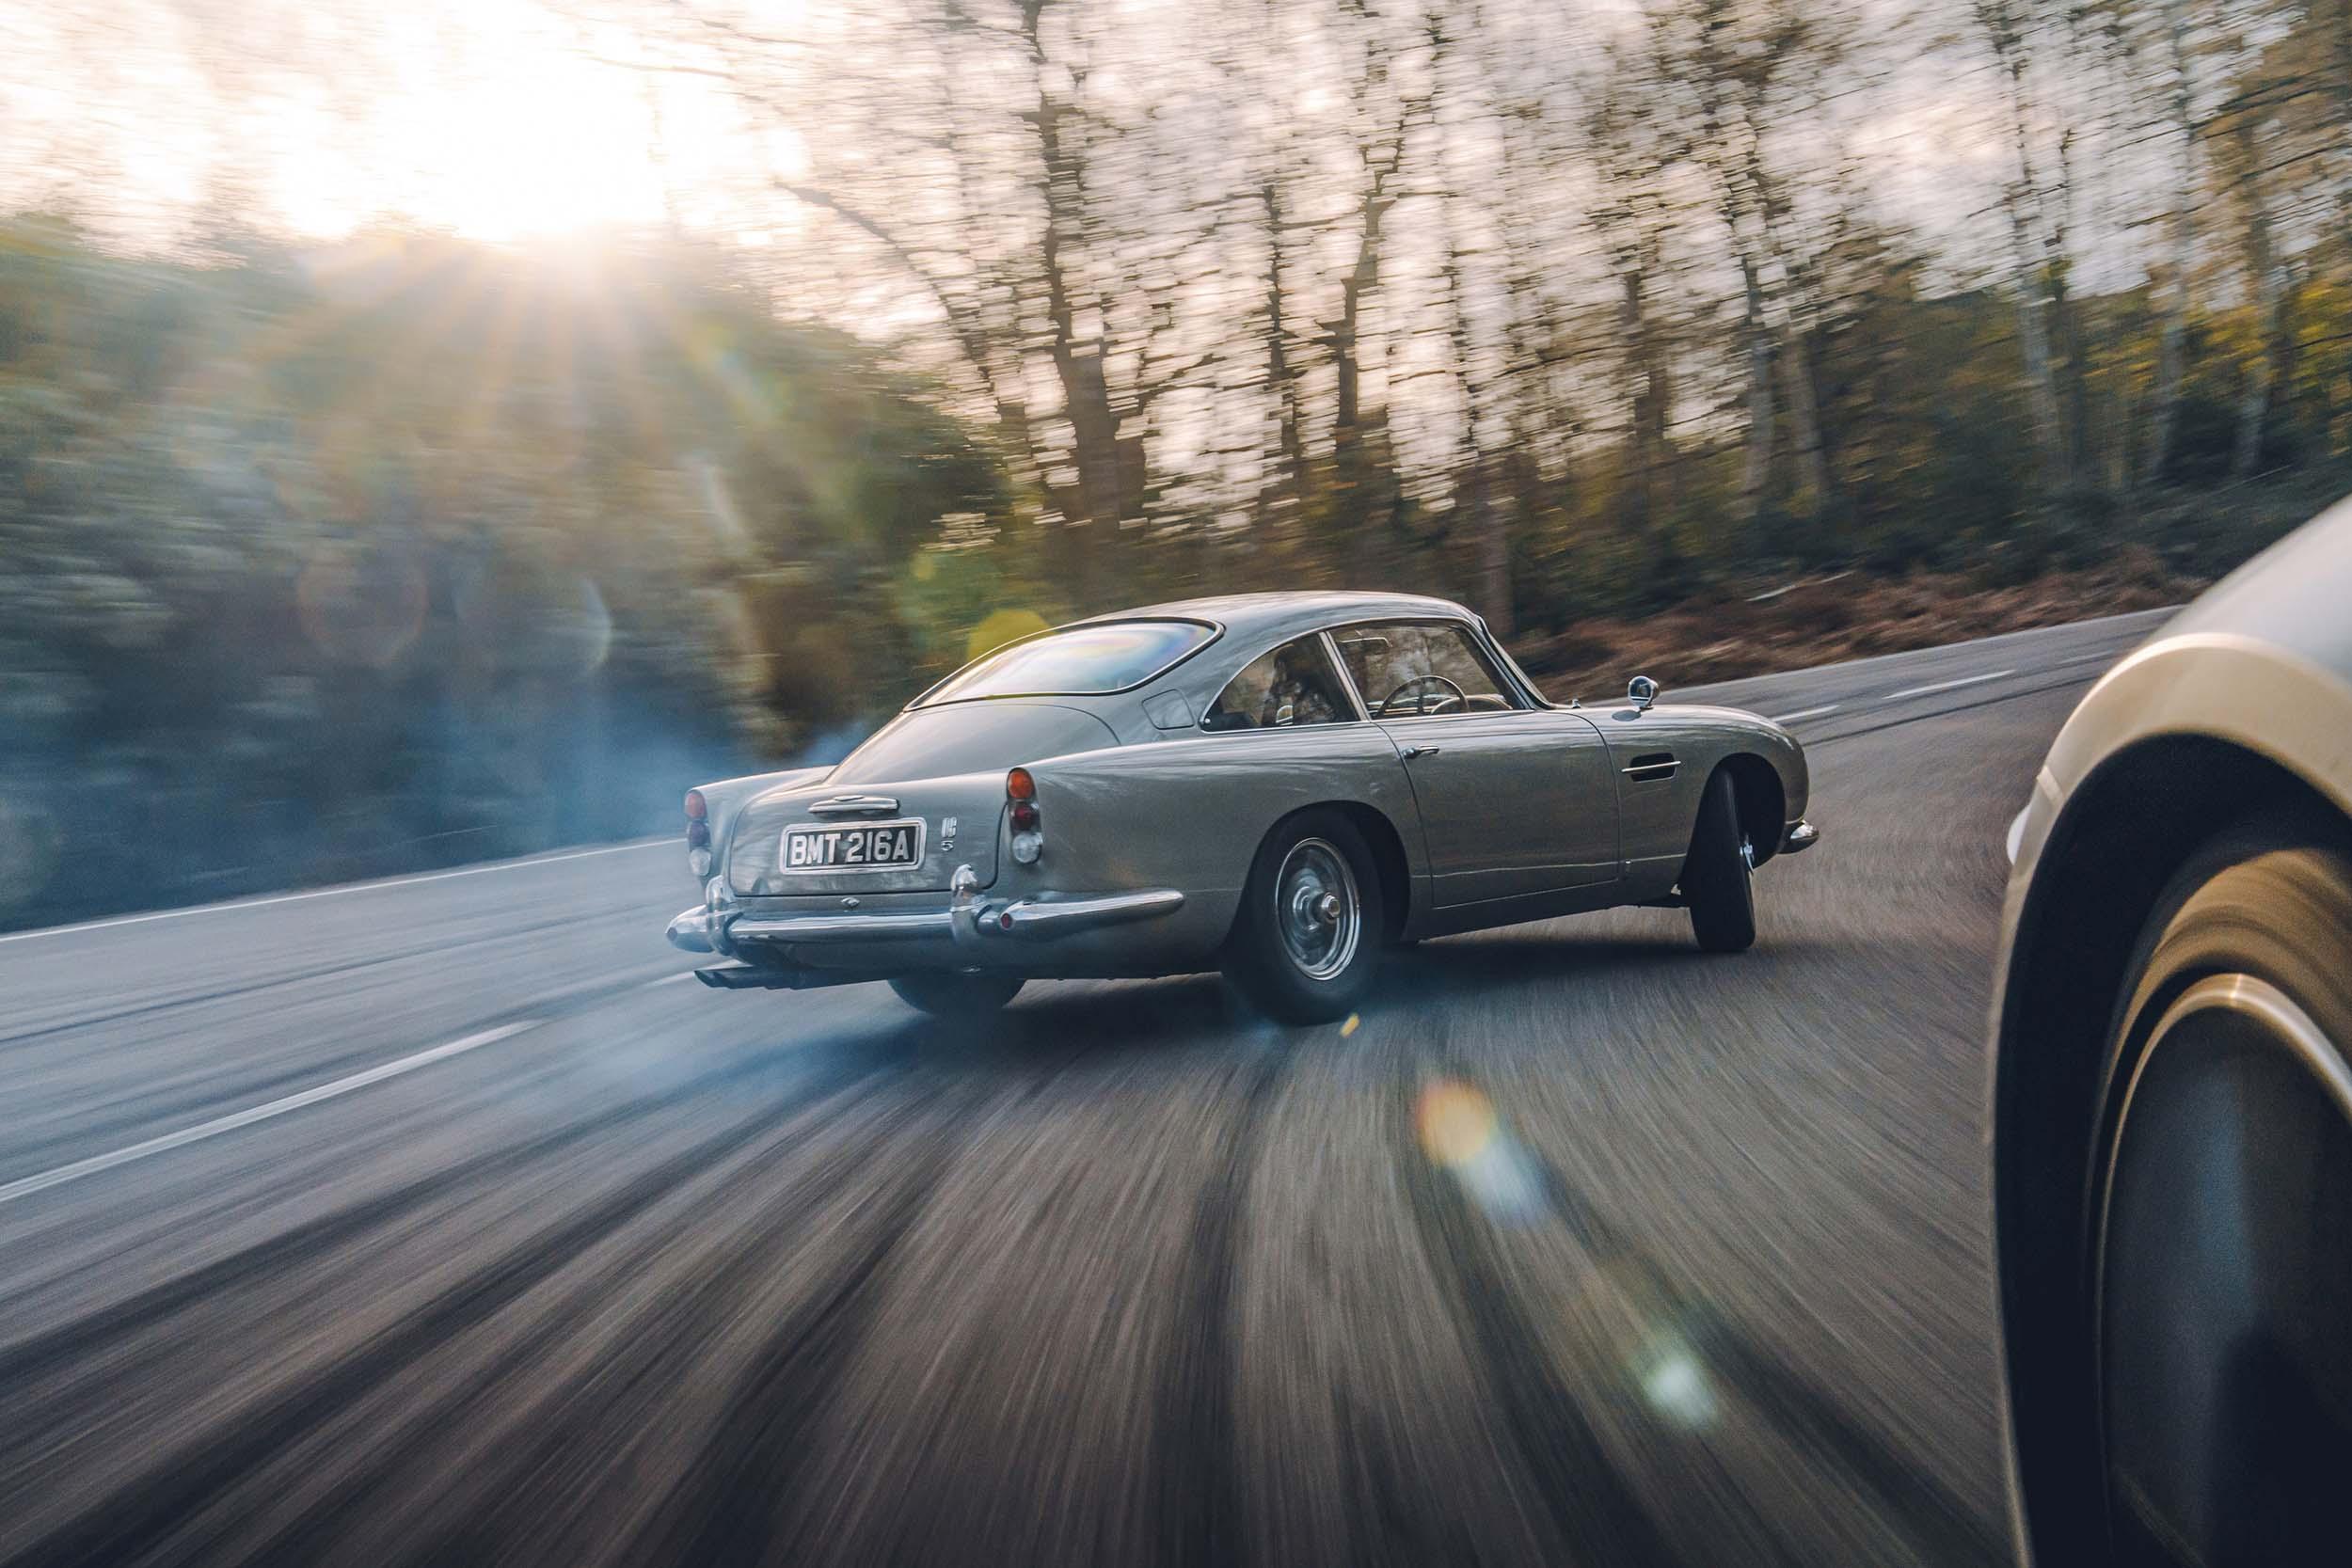 Drift Aston Martin DB5 van James Bond (007)